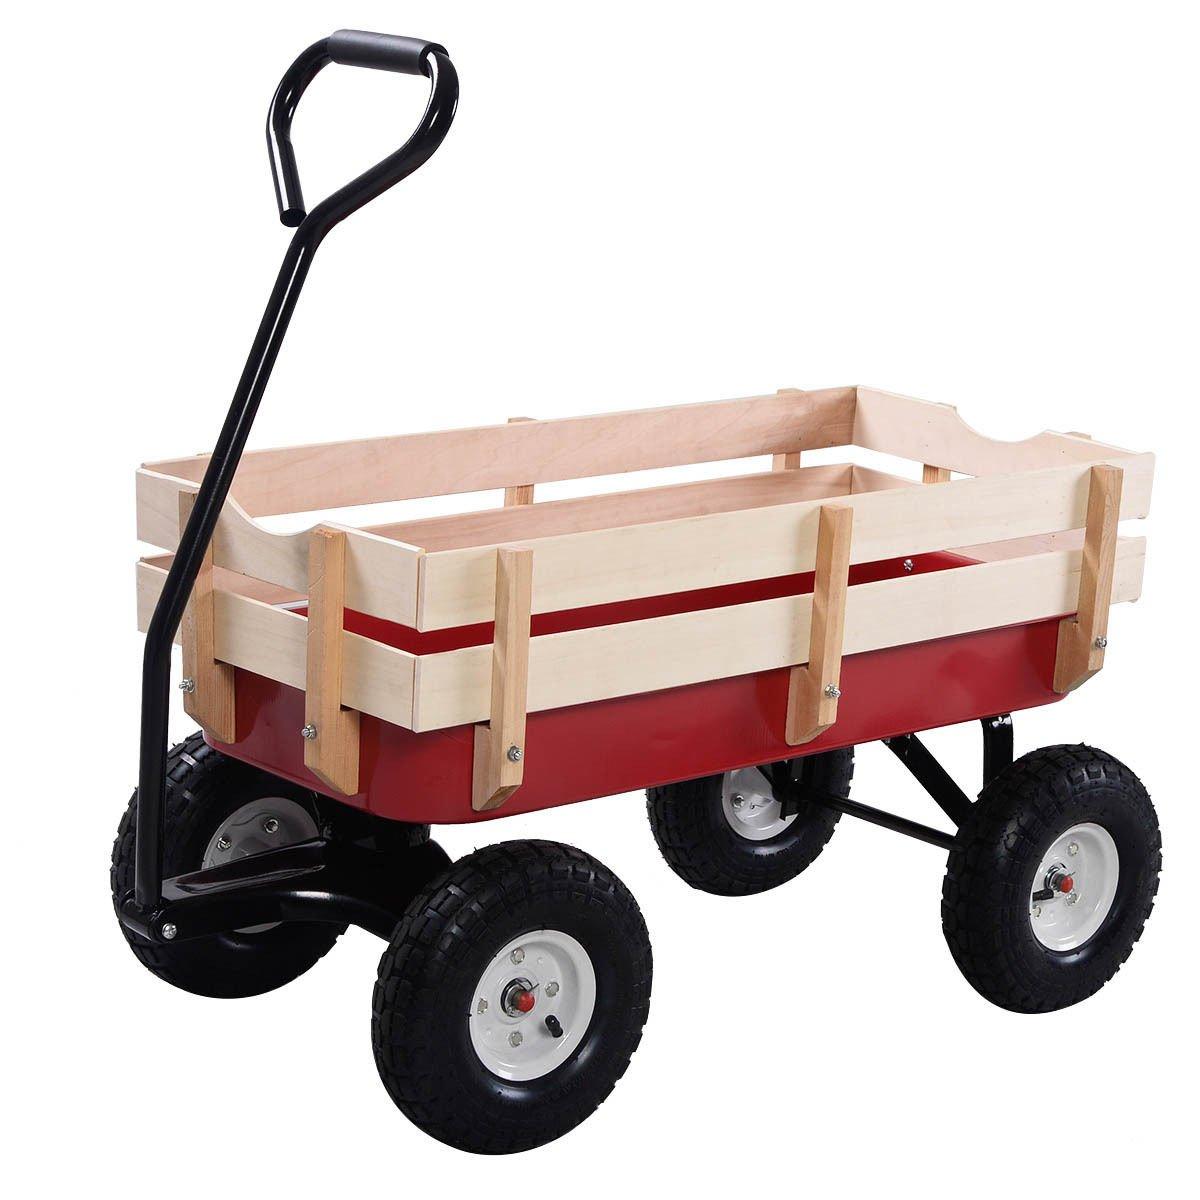 Amazon.com : Giantex All Terrain Cargo Wagon Wood Railing Kids Children  Garden Air Tires Outdoor Red : Garden U0026 Outdoor